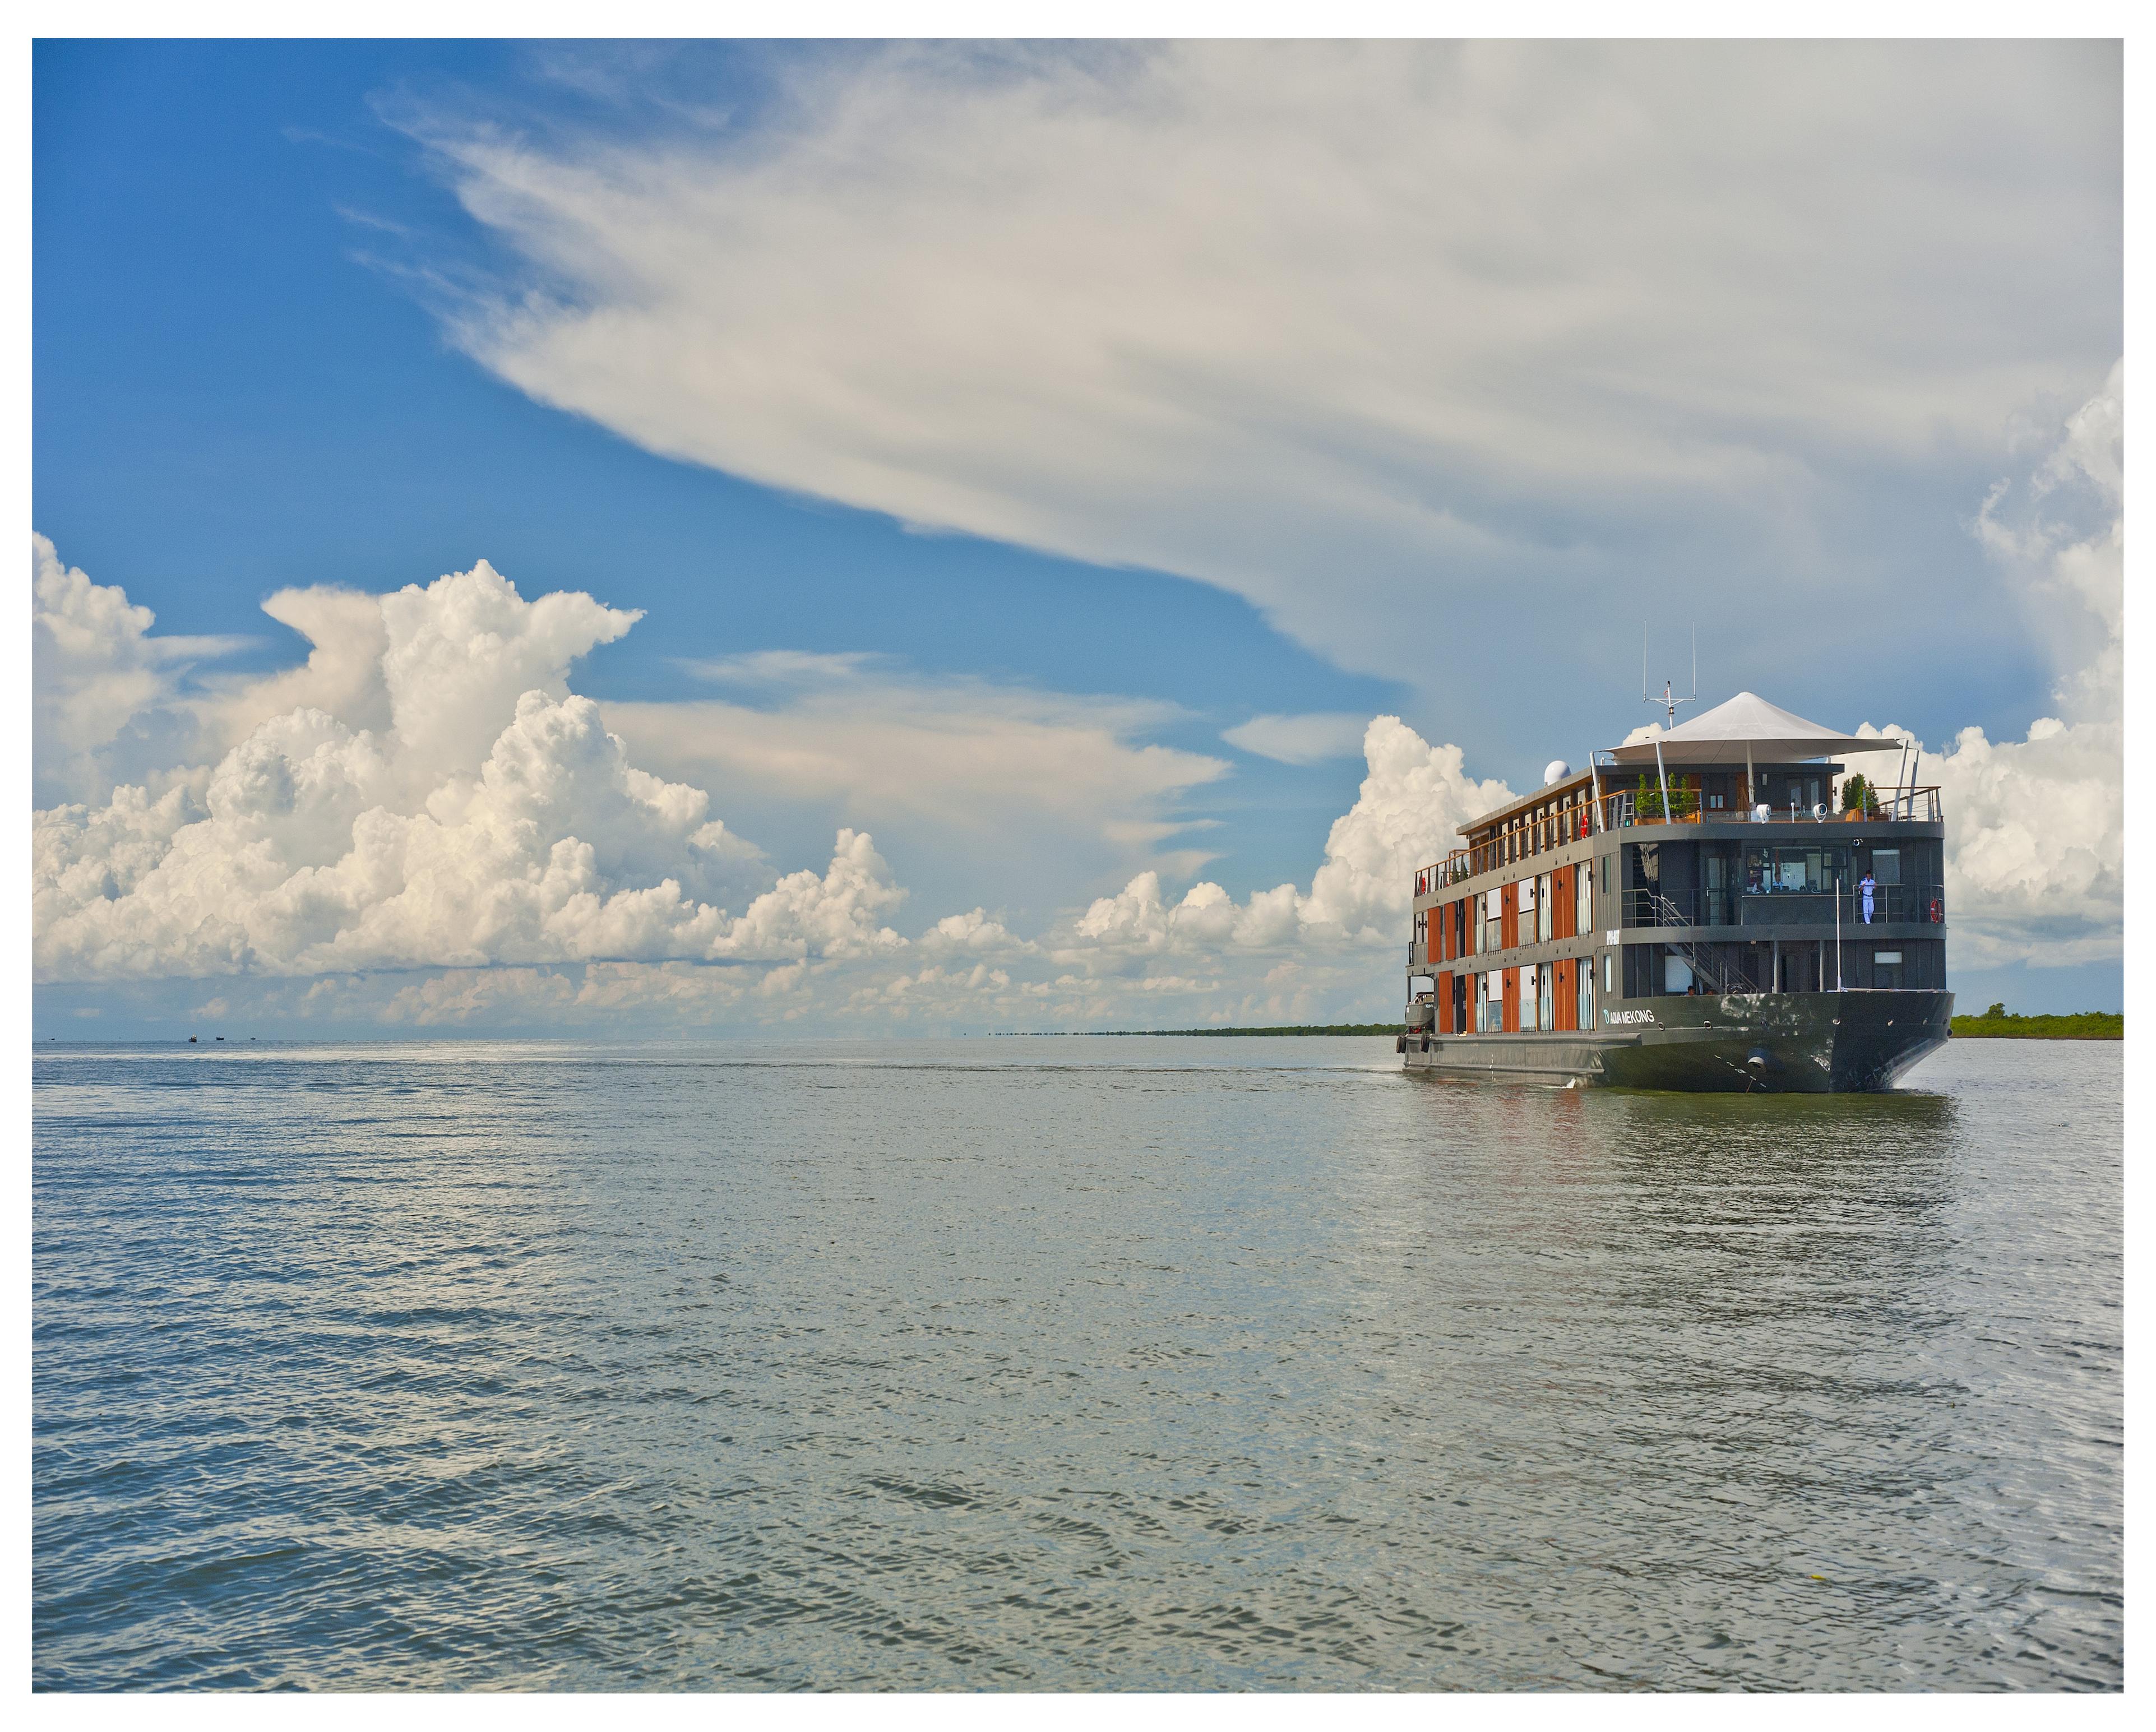 COMBINED TOUR - Cruise - Aqua Mekong Boat 9 Days / 8 Nights - Easia